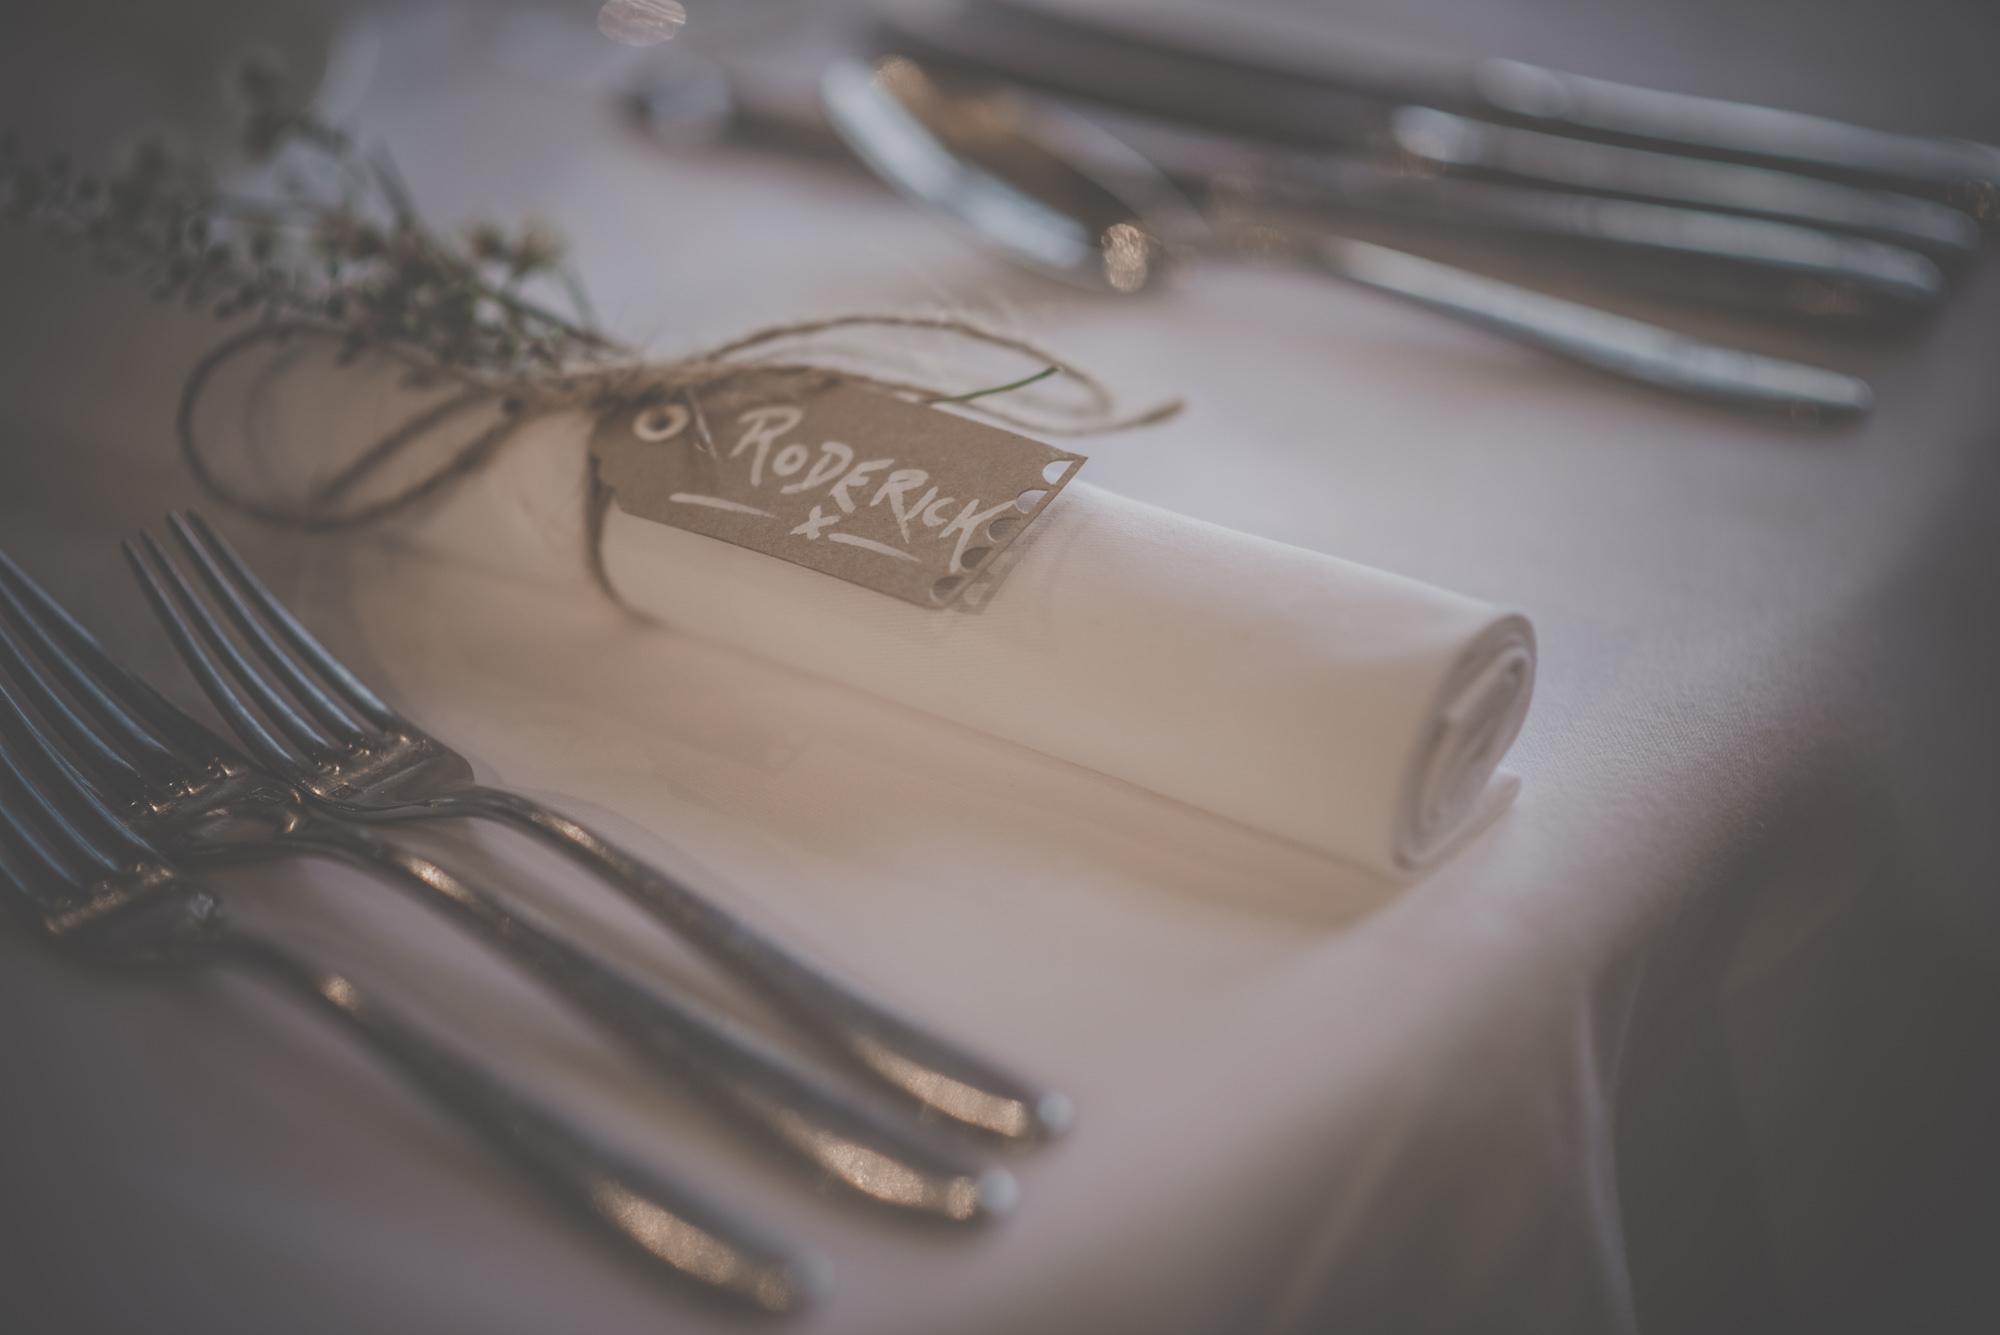 Charisse-and-James-wedding-in-Cain-Manor-Venue-Hampshire-Manu-Mendoza-Wedding-Photography-405.jpg